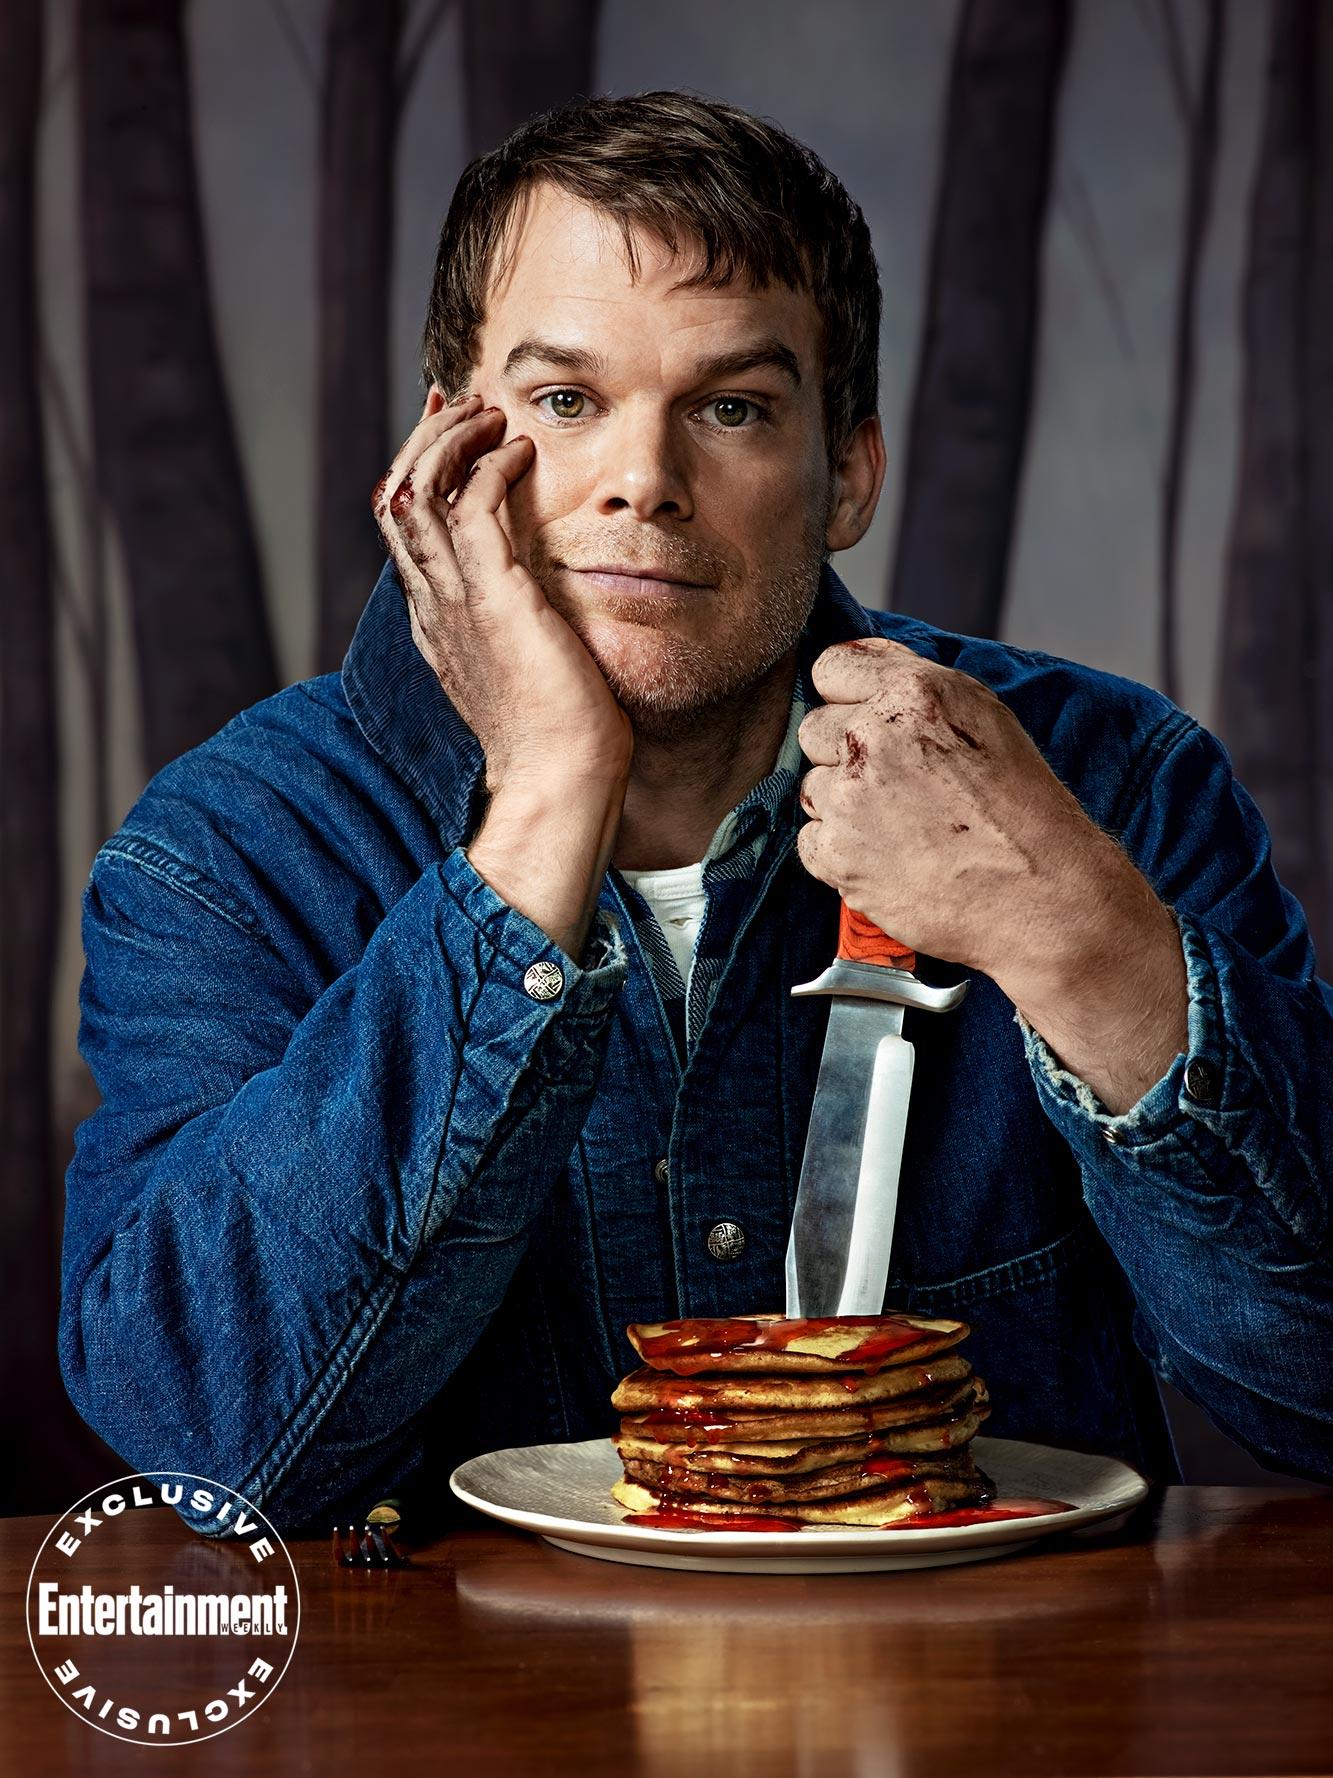 Michael C. Hall as Dexter